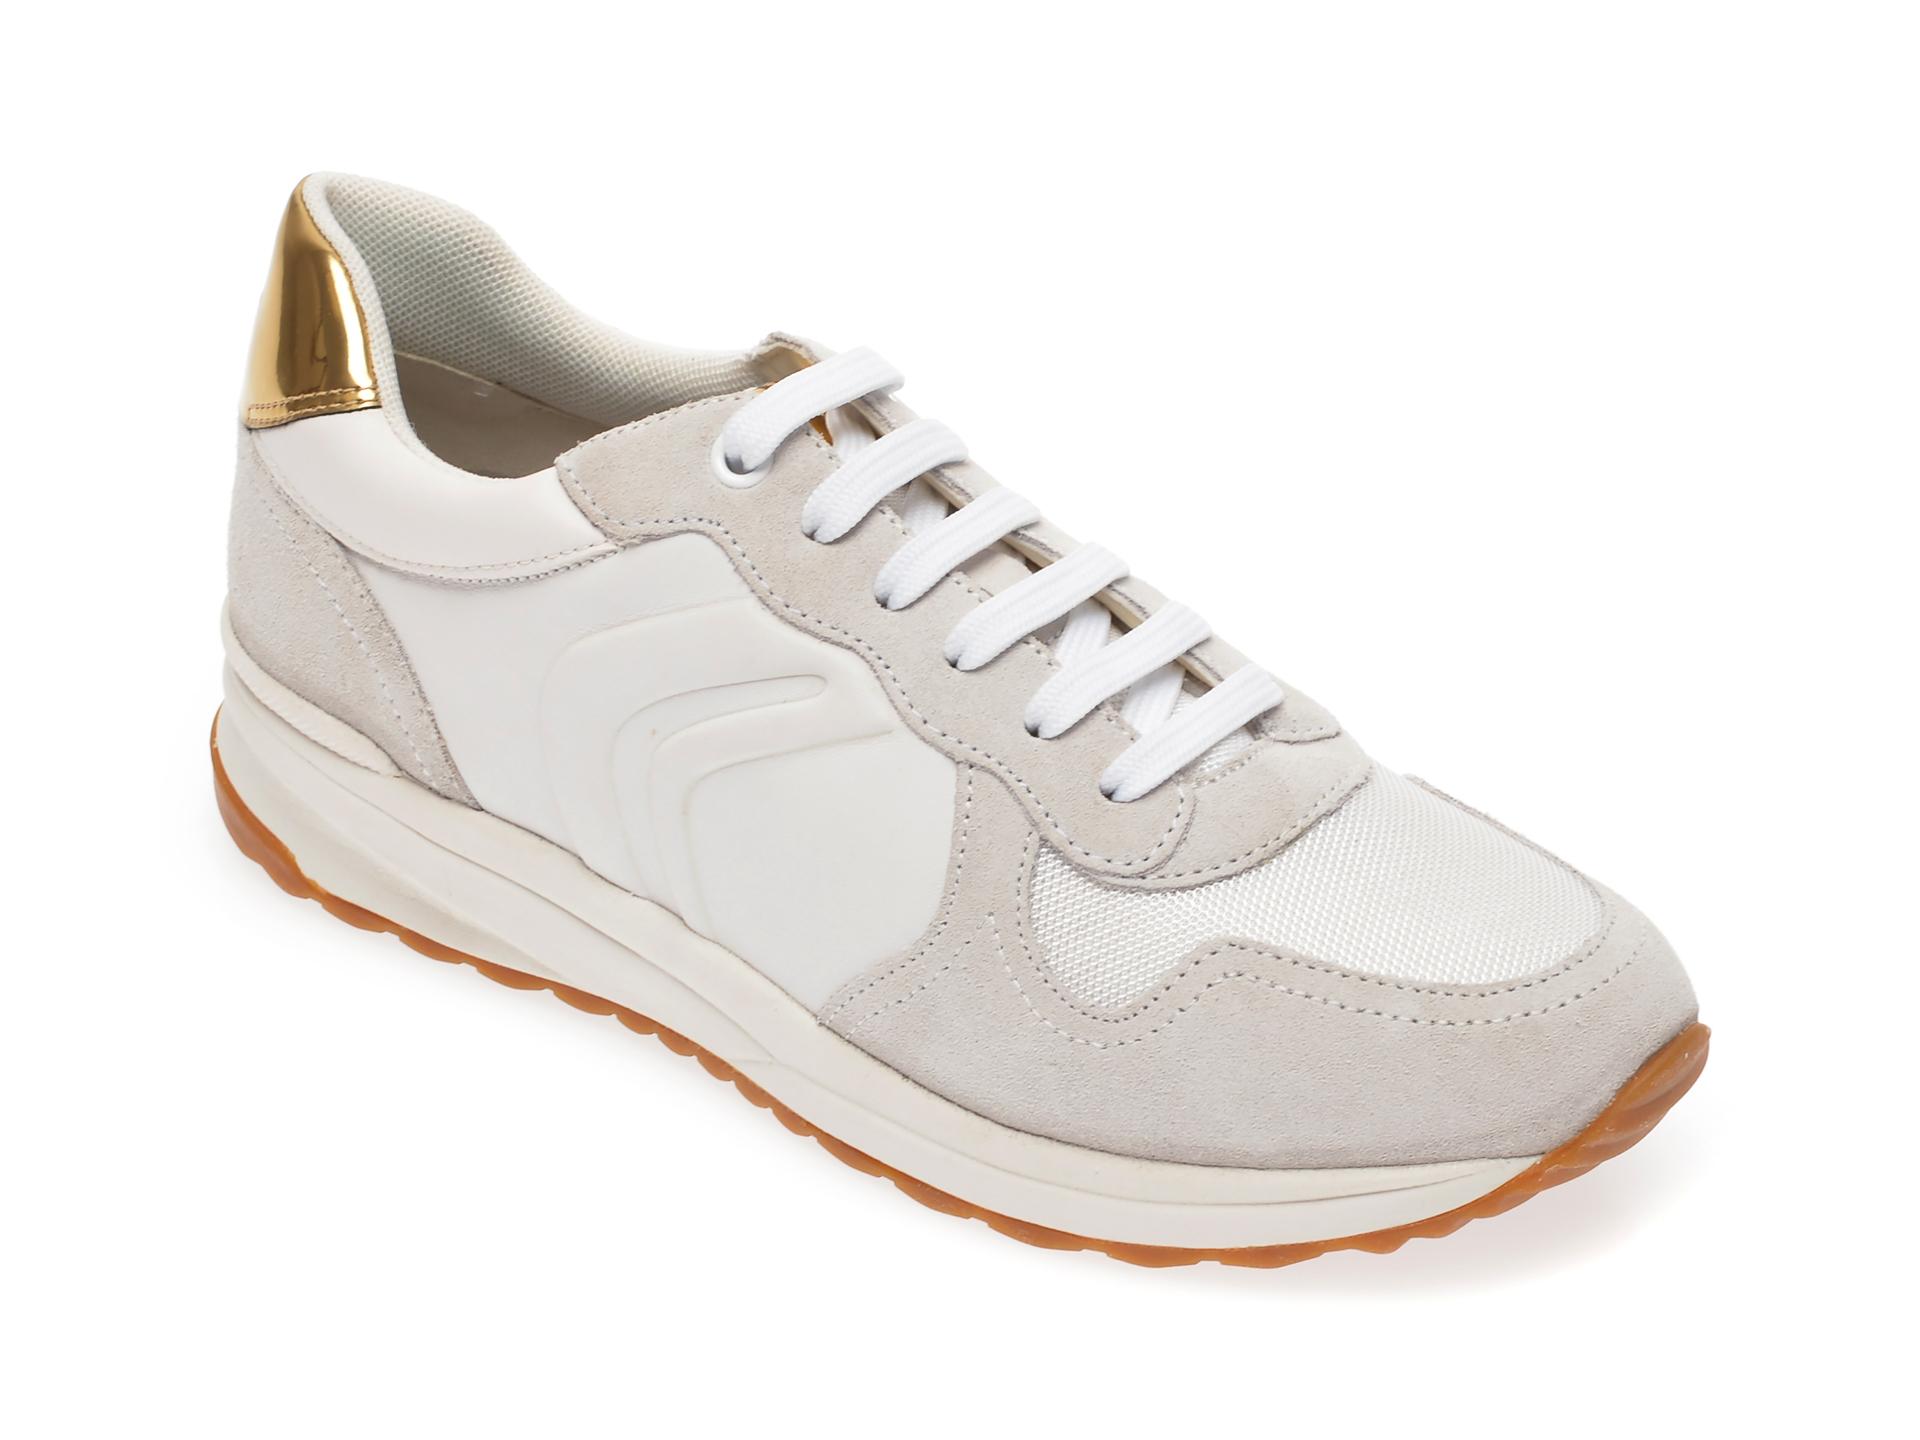 Pantofi sport GEOX albi, D022SC, din material textil si piele naturala